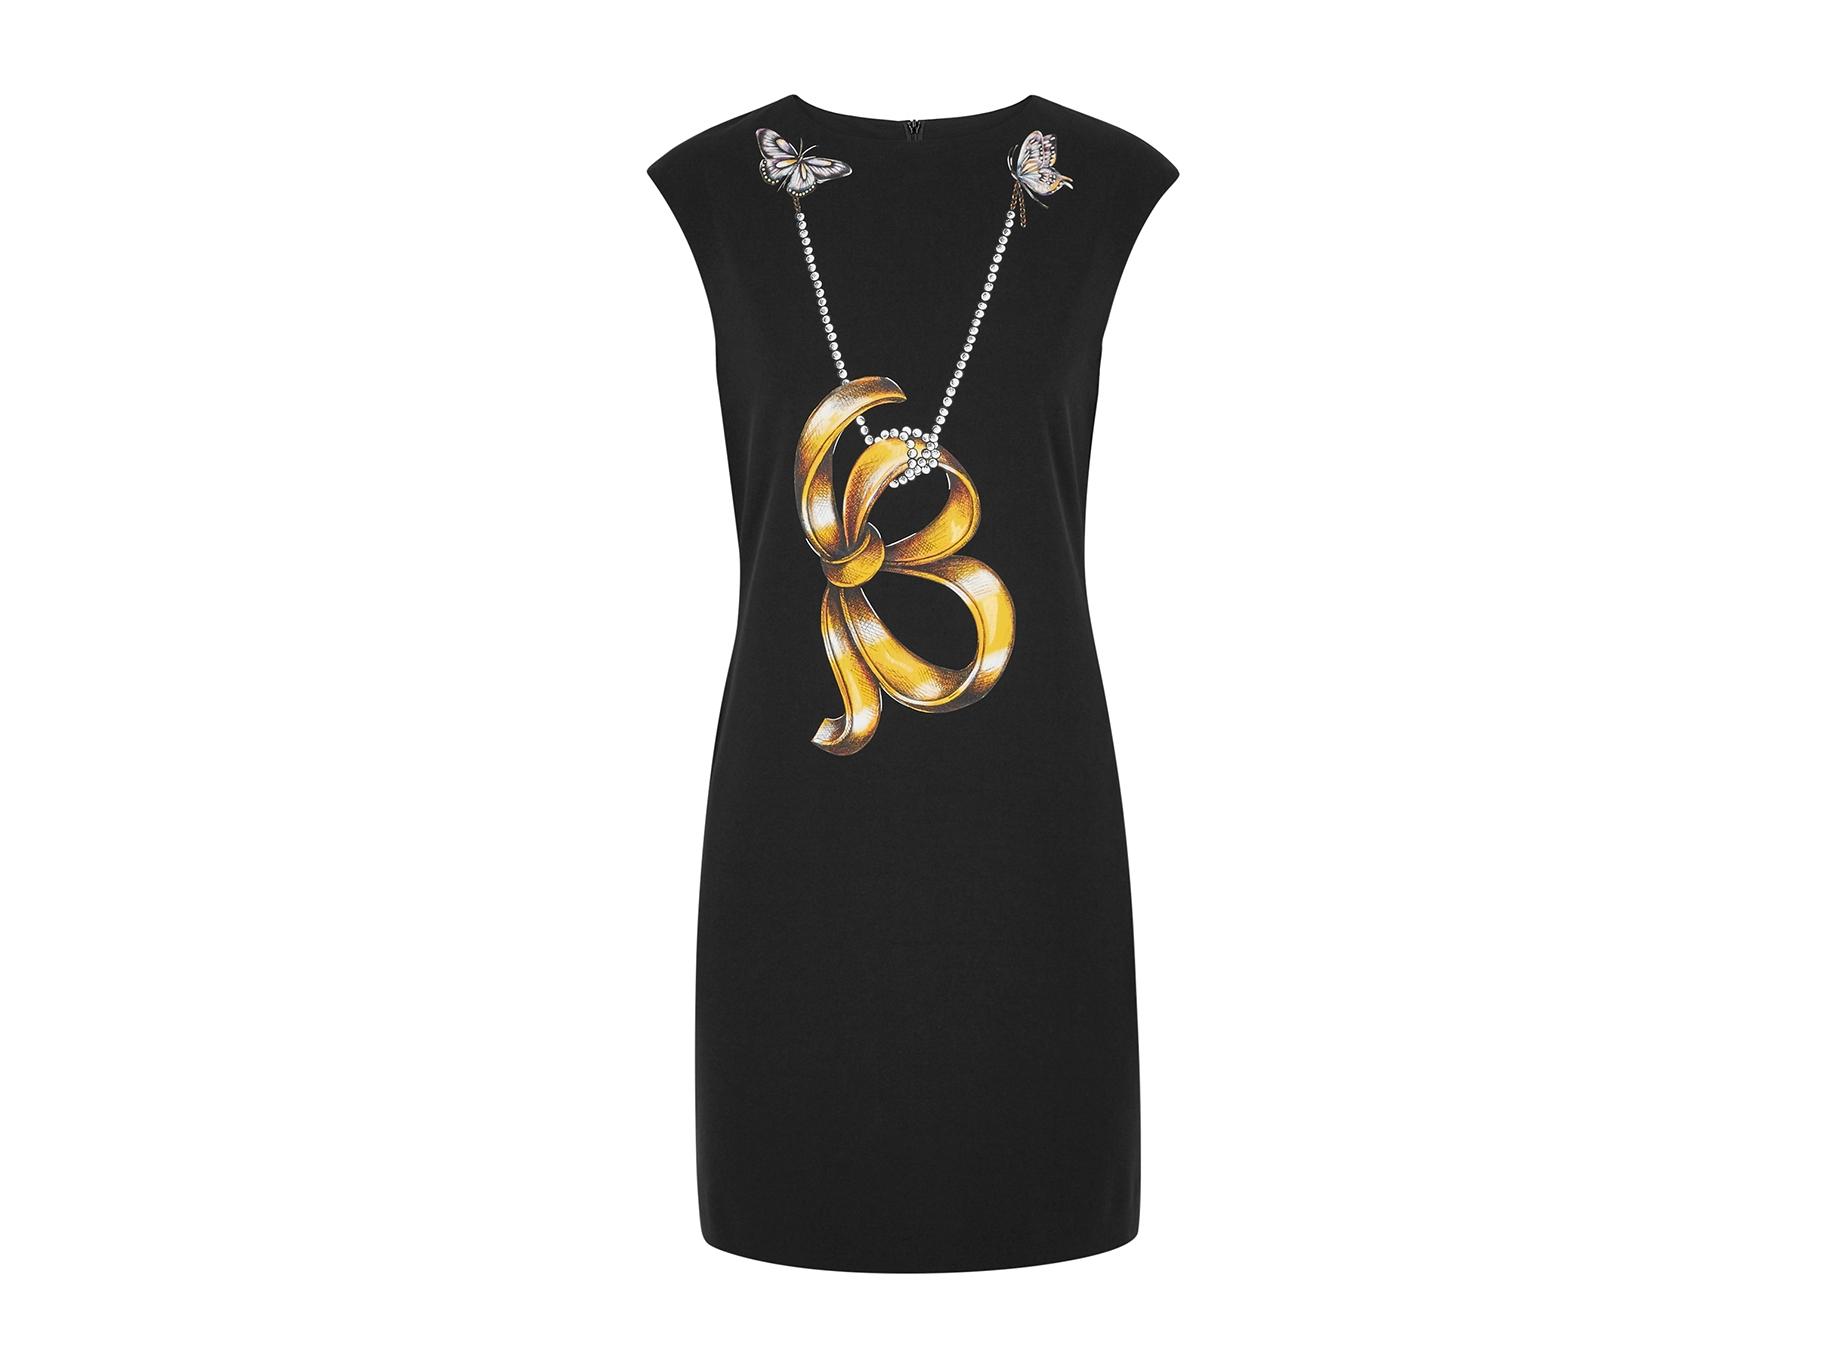 db5af4139f Boutique Moschino Black printed shift dress - Harvey Nichols